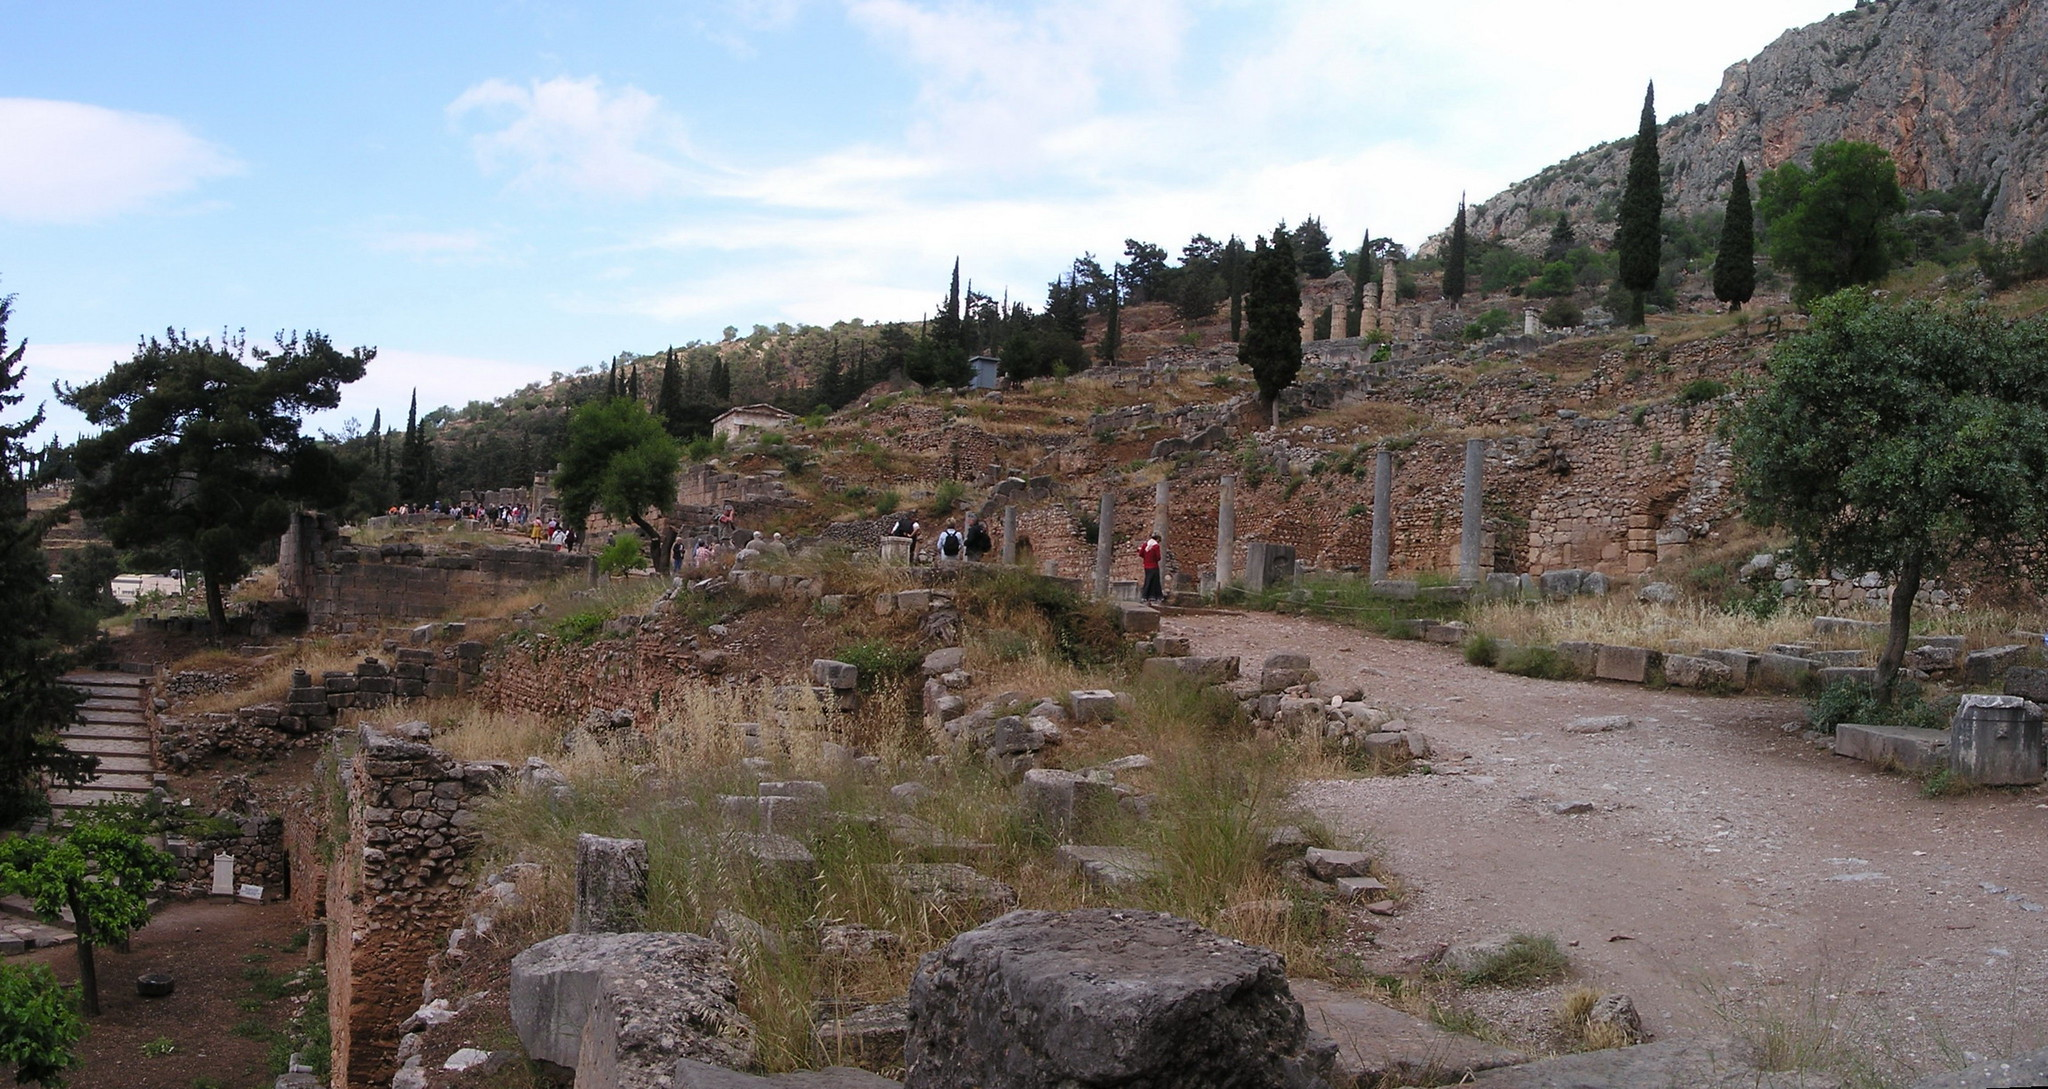 Grecia Oraculo de Delfos Monumento espartano a Egospotamos